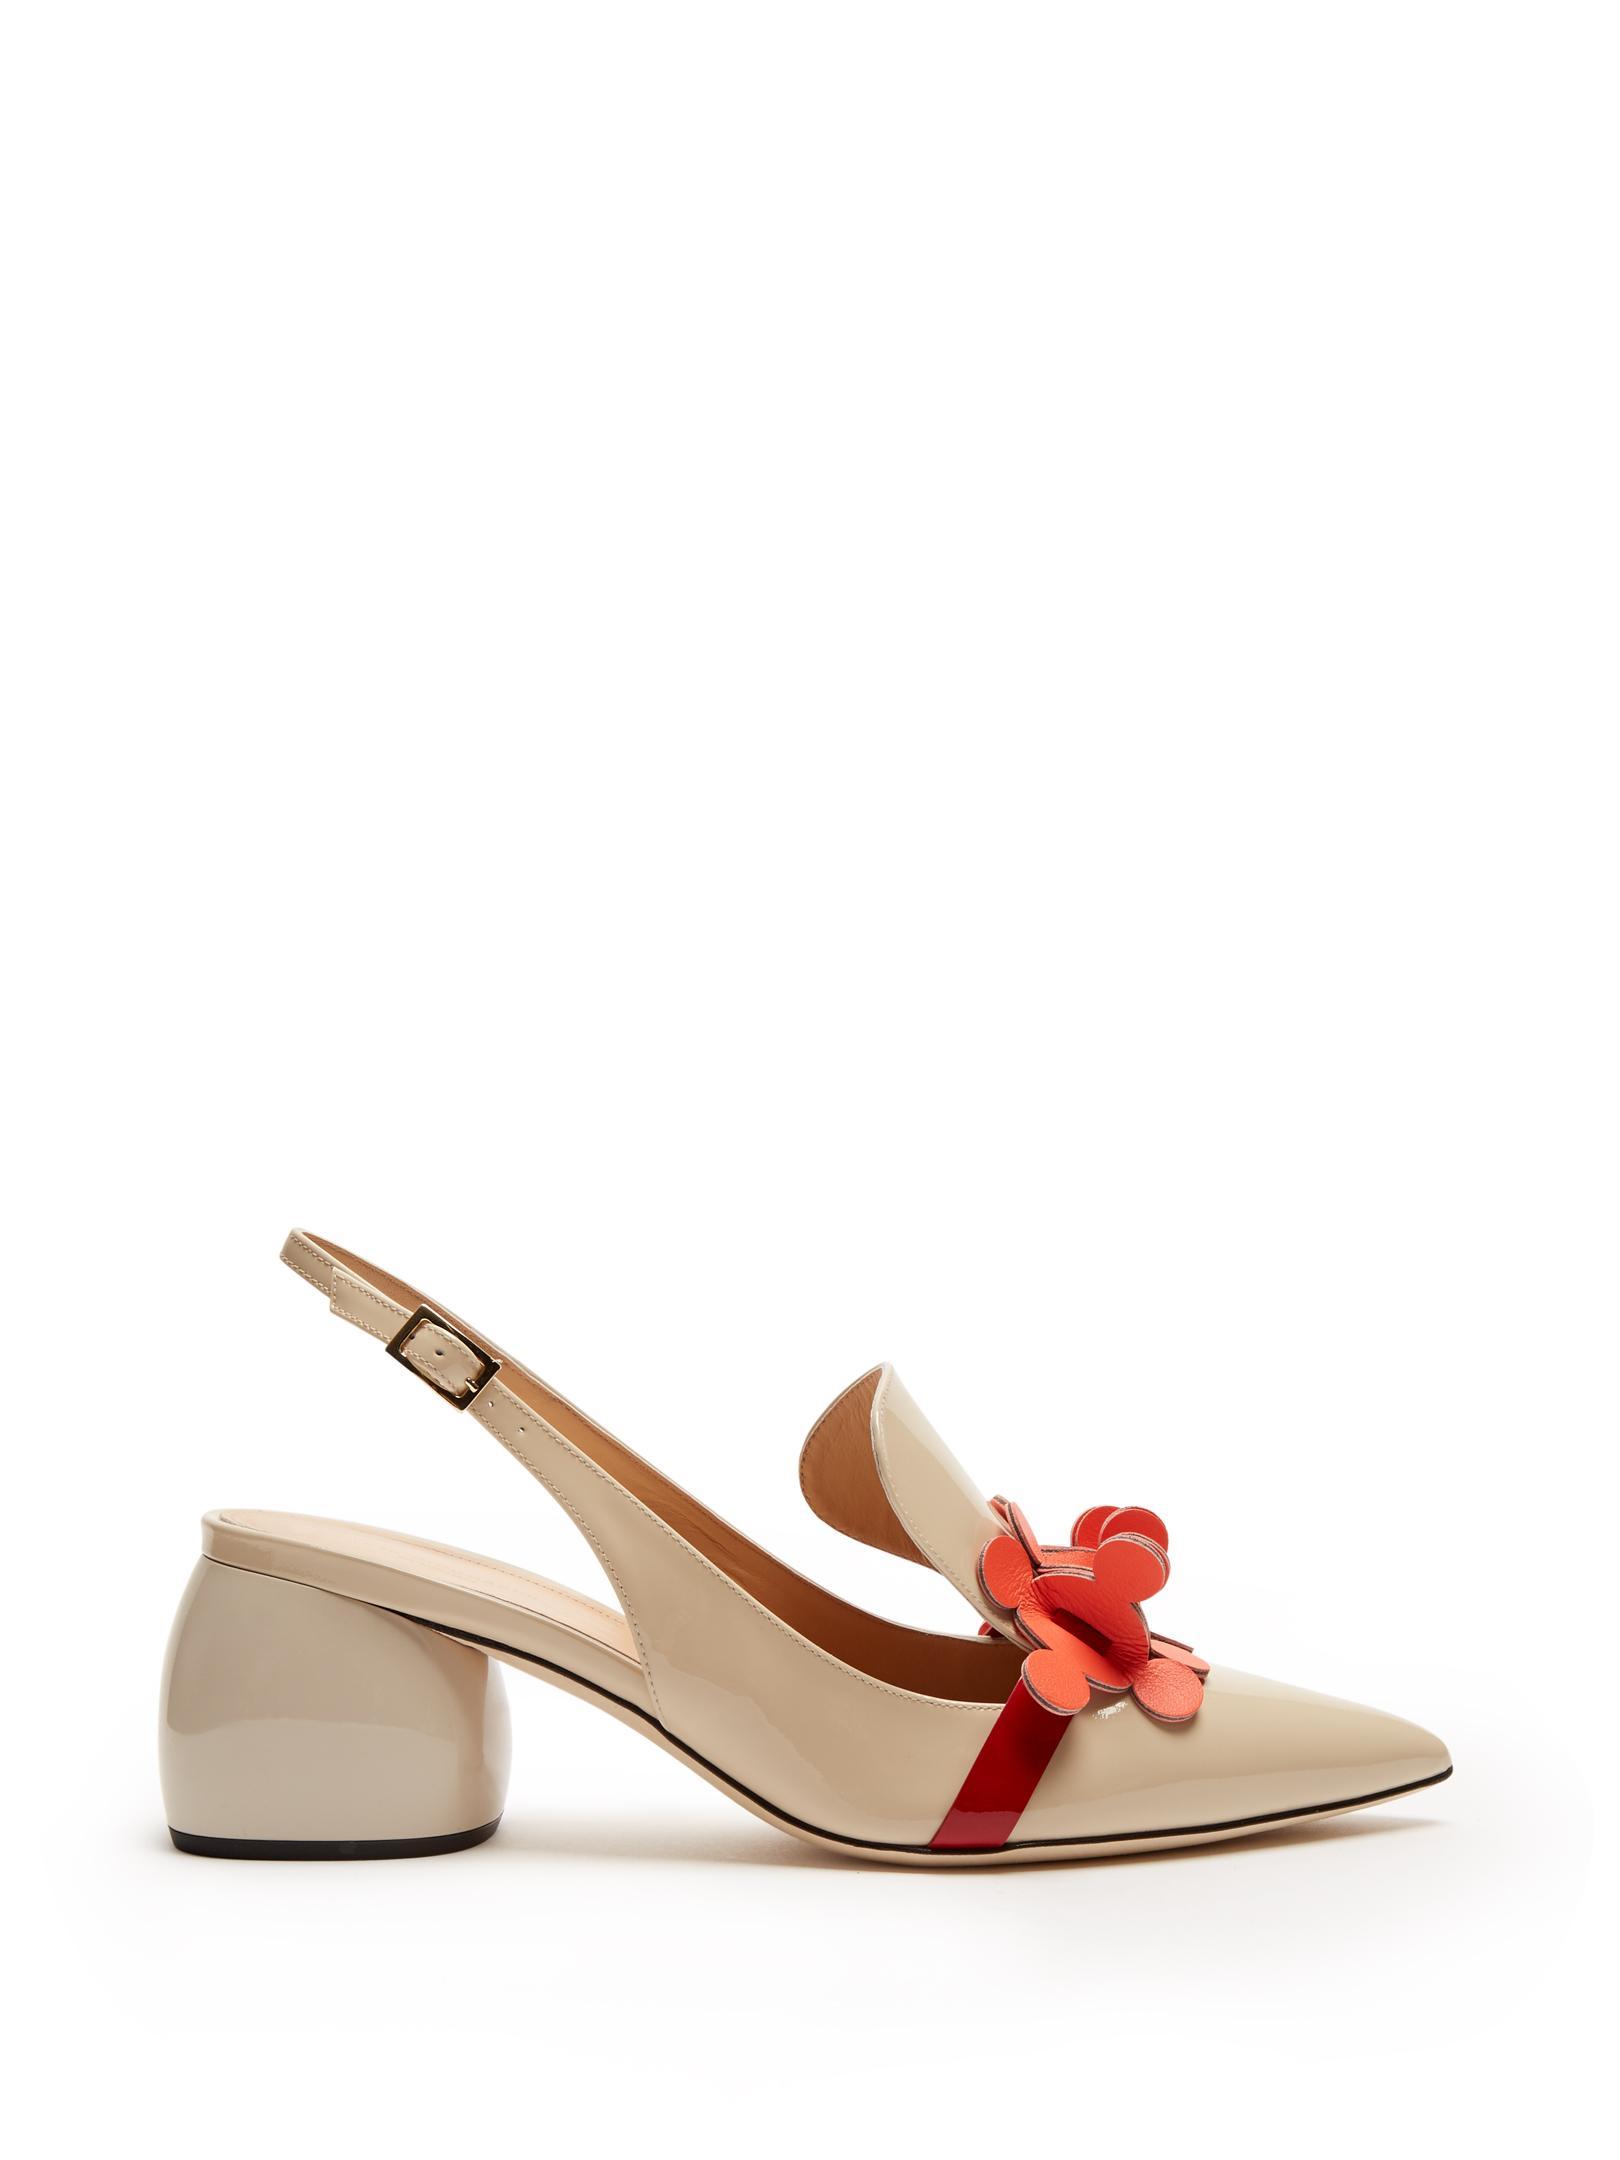 Apex Shoes Adjustable Heels